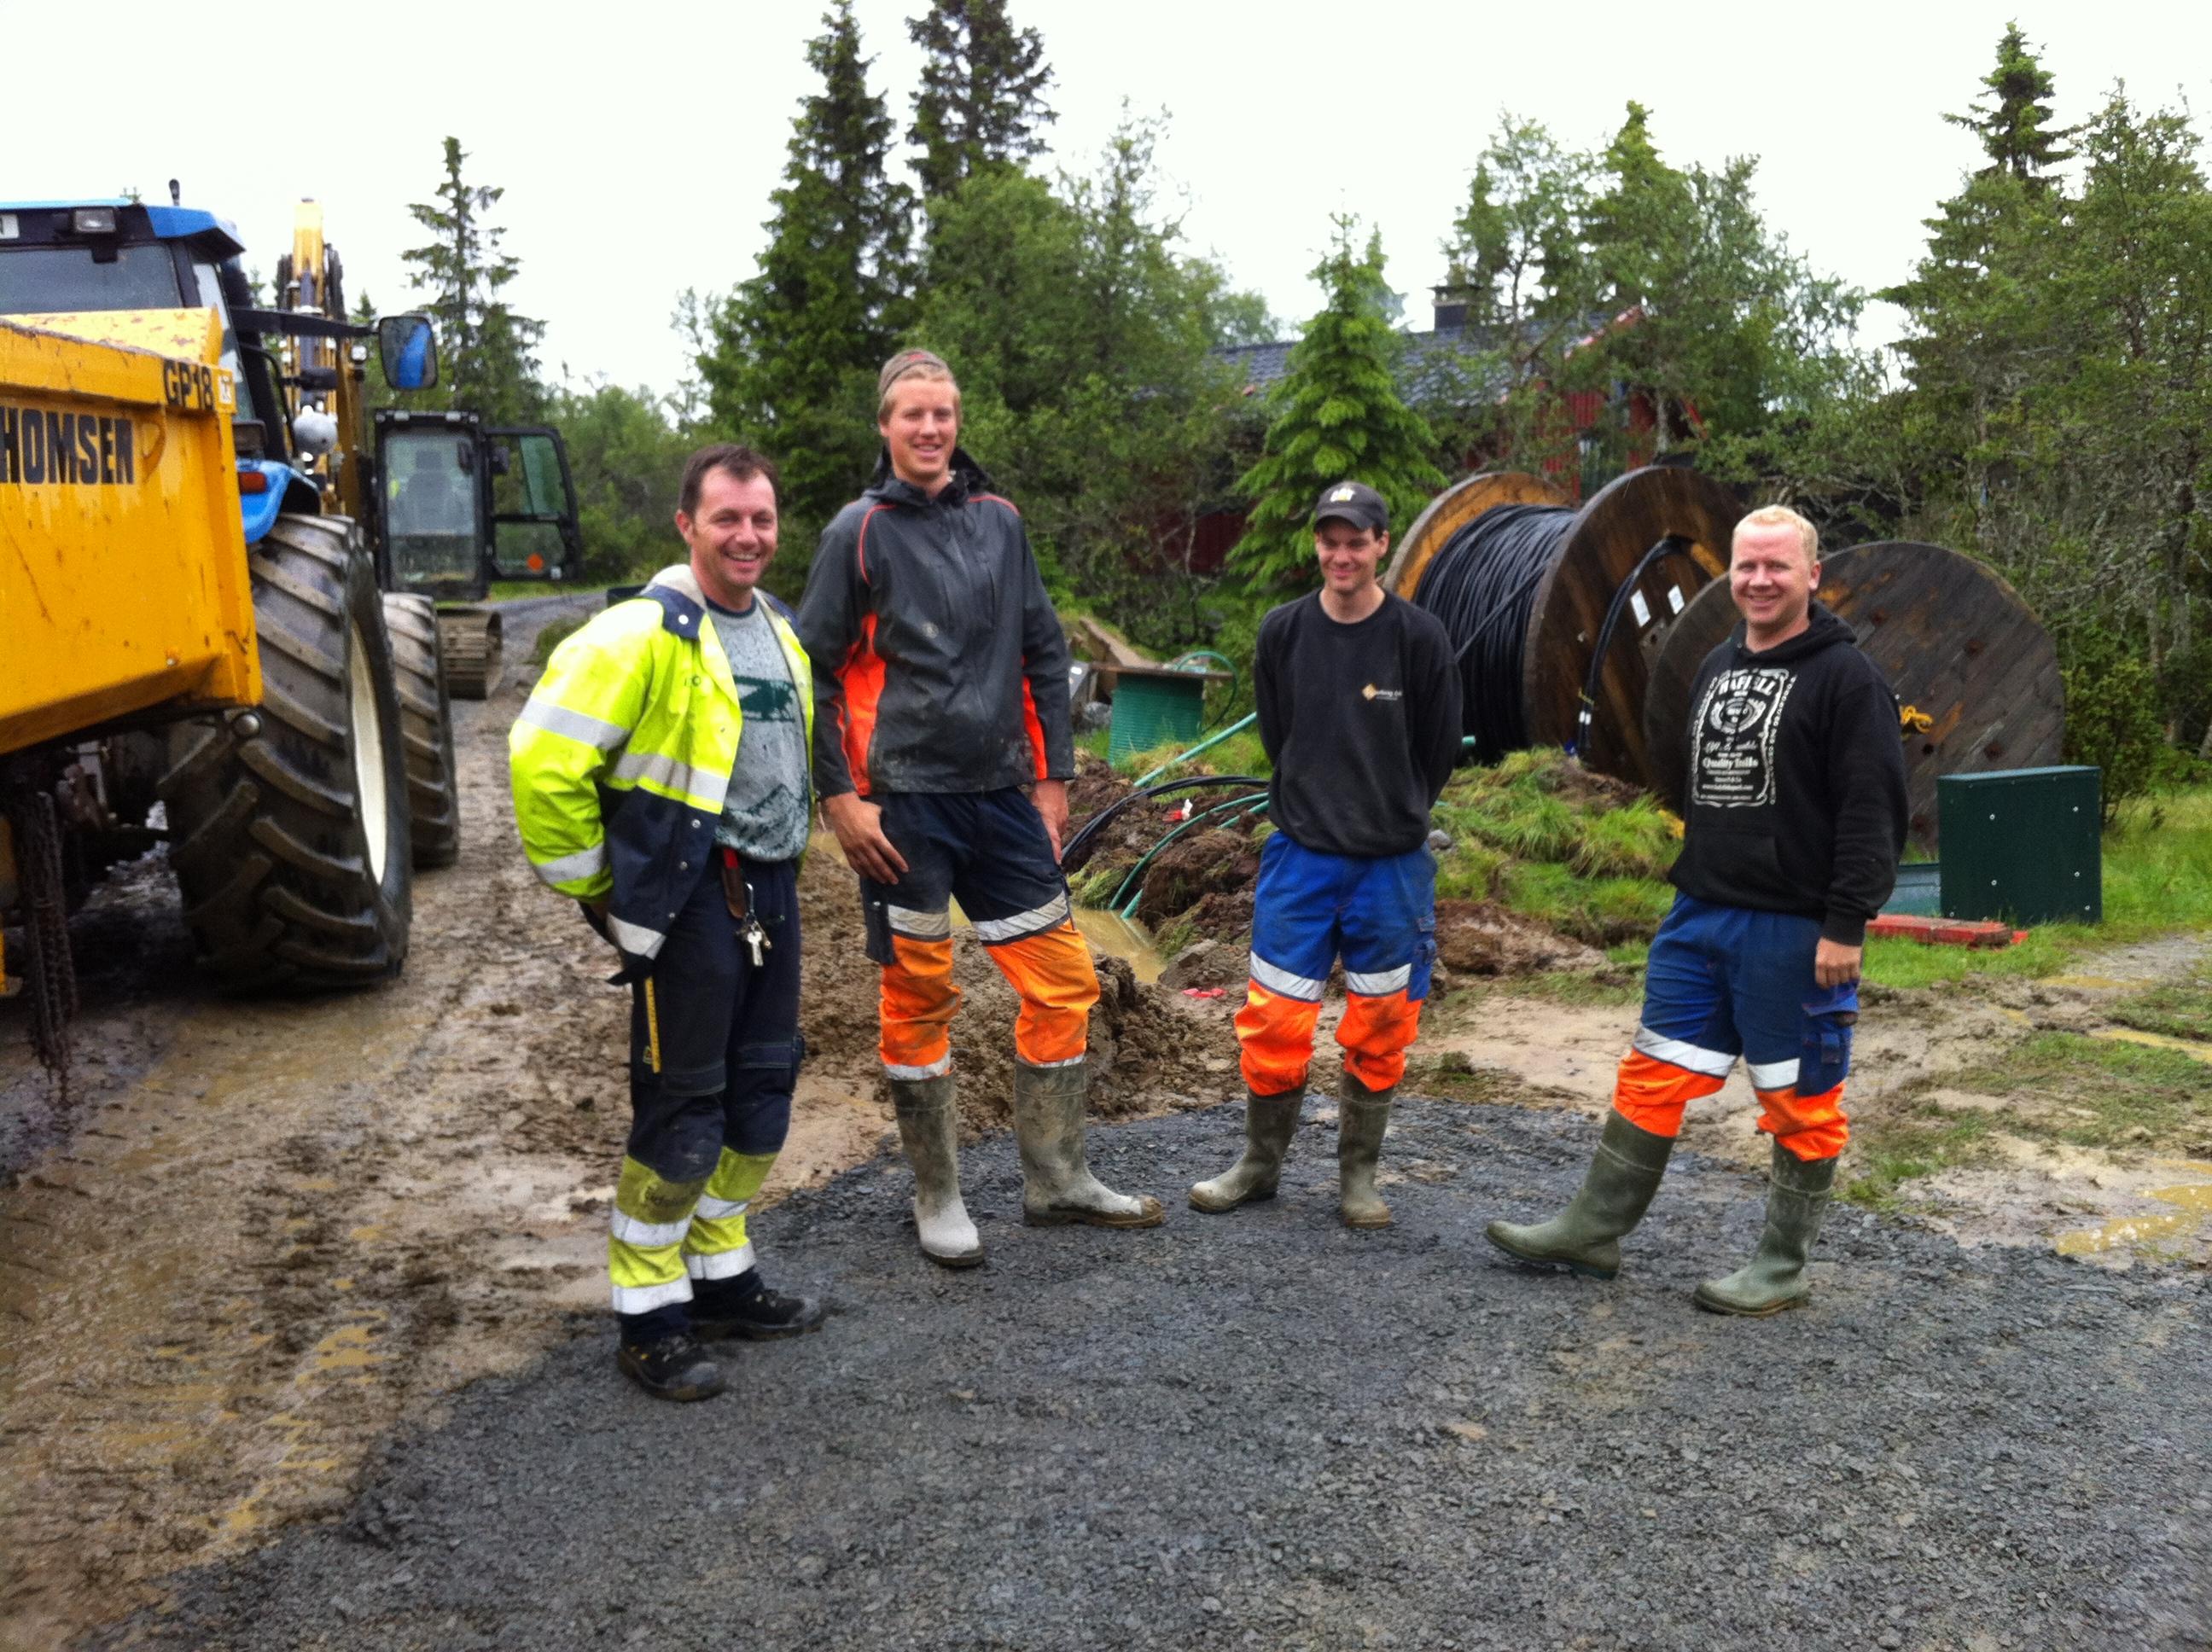 Sten Vidar Hovde, Eidsiva, og tre blide gutter fra Kvarberg AS. Foto: Erik helli